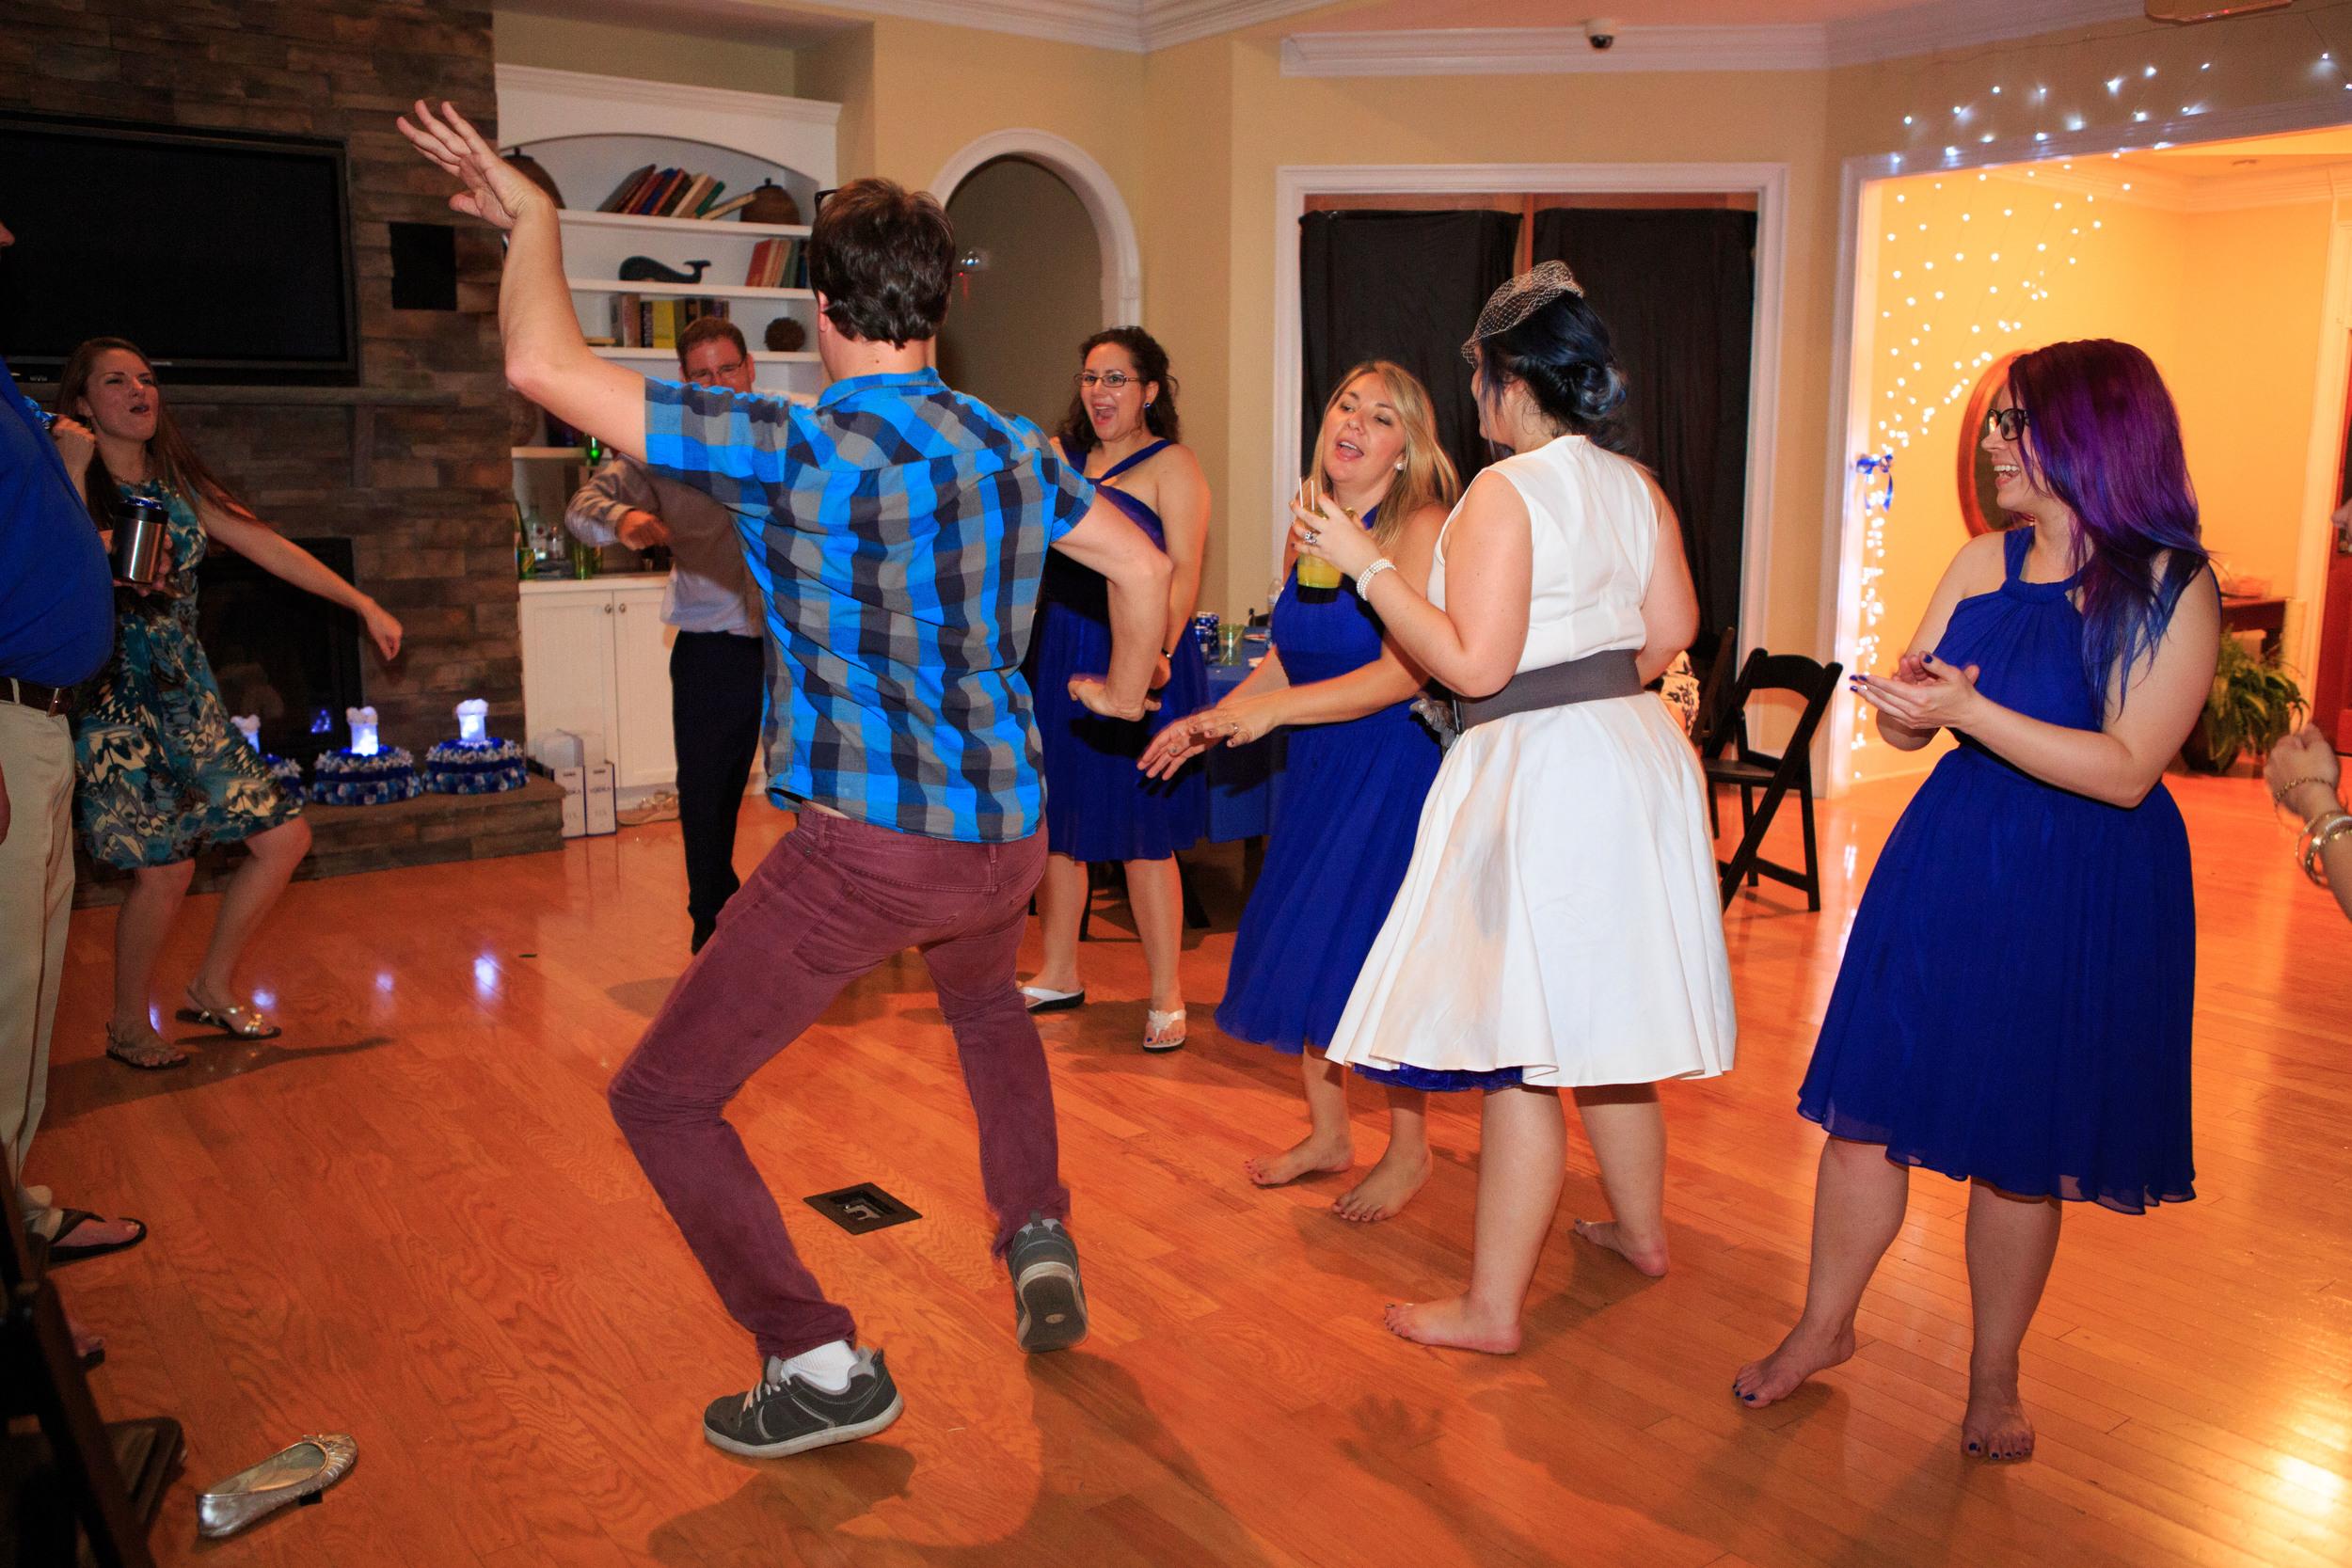 Leland_Wedding_Photographer_Tiffany_Abruzzo_Reception_178.jpg